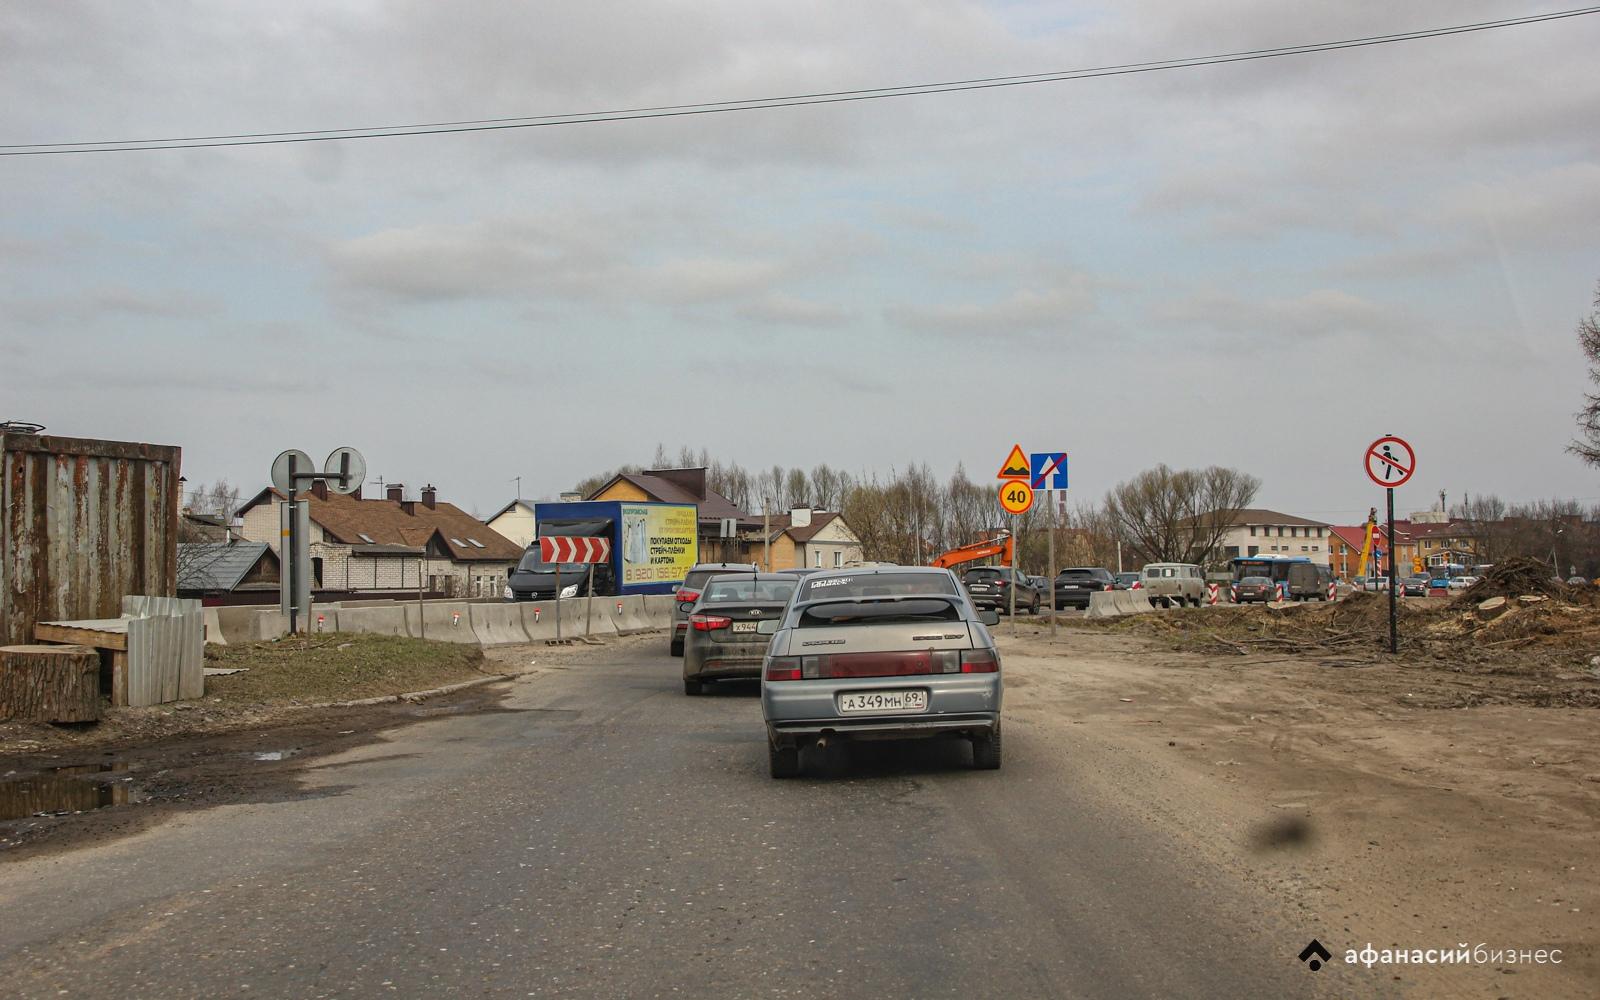 В Твери принято решение об установке светофора на Бежецком шоссе - новости Афанасий